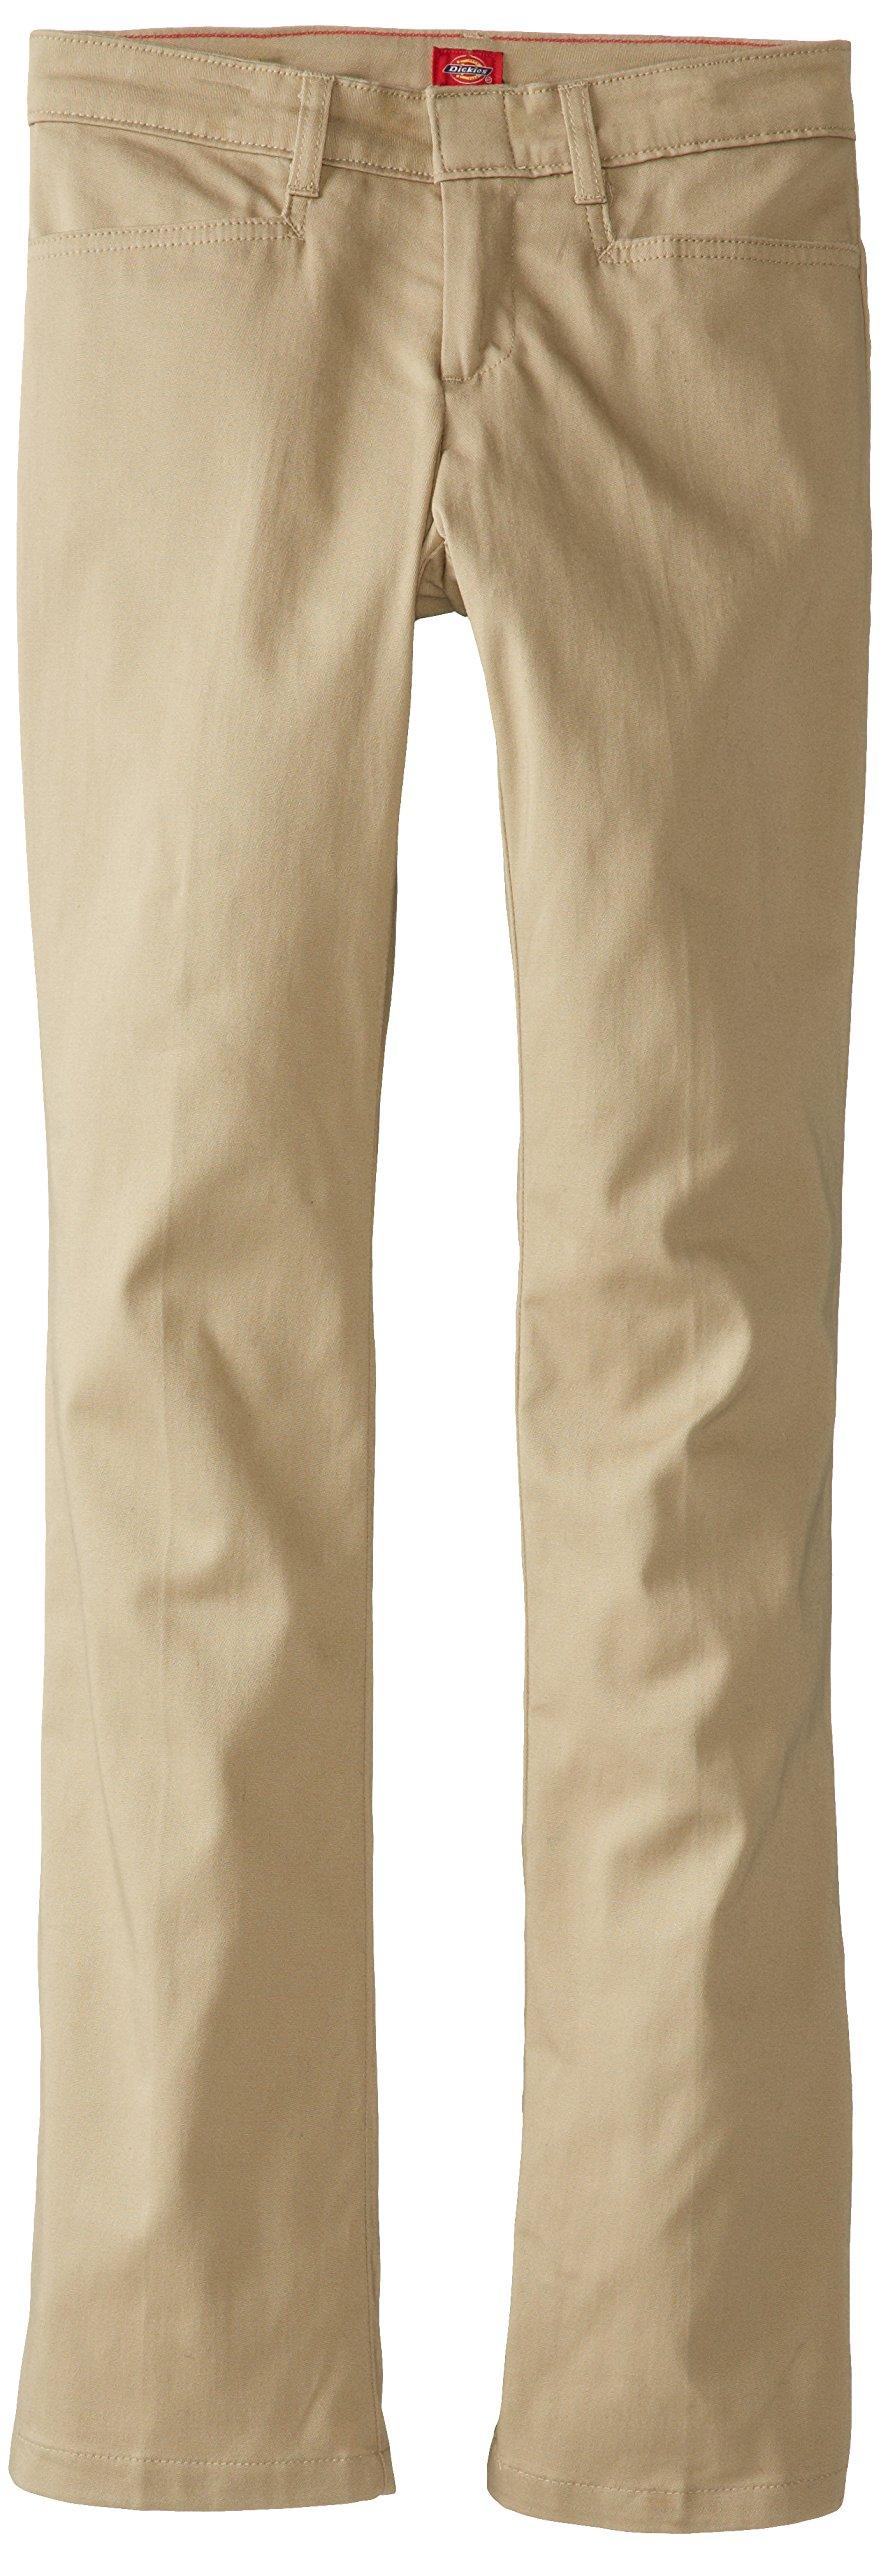 Dickies Juniors Classic Stretch Bootcut Pant, Desert Sand, 5